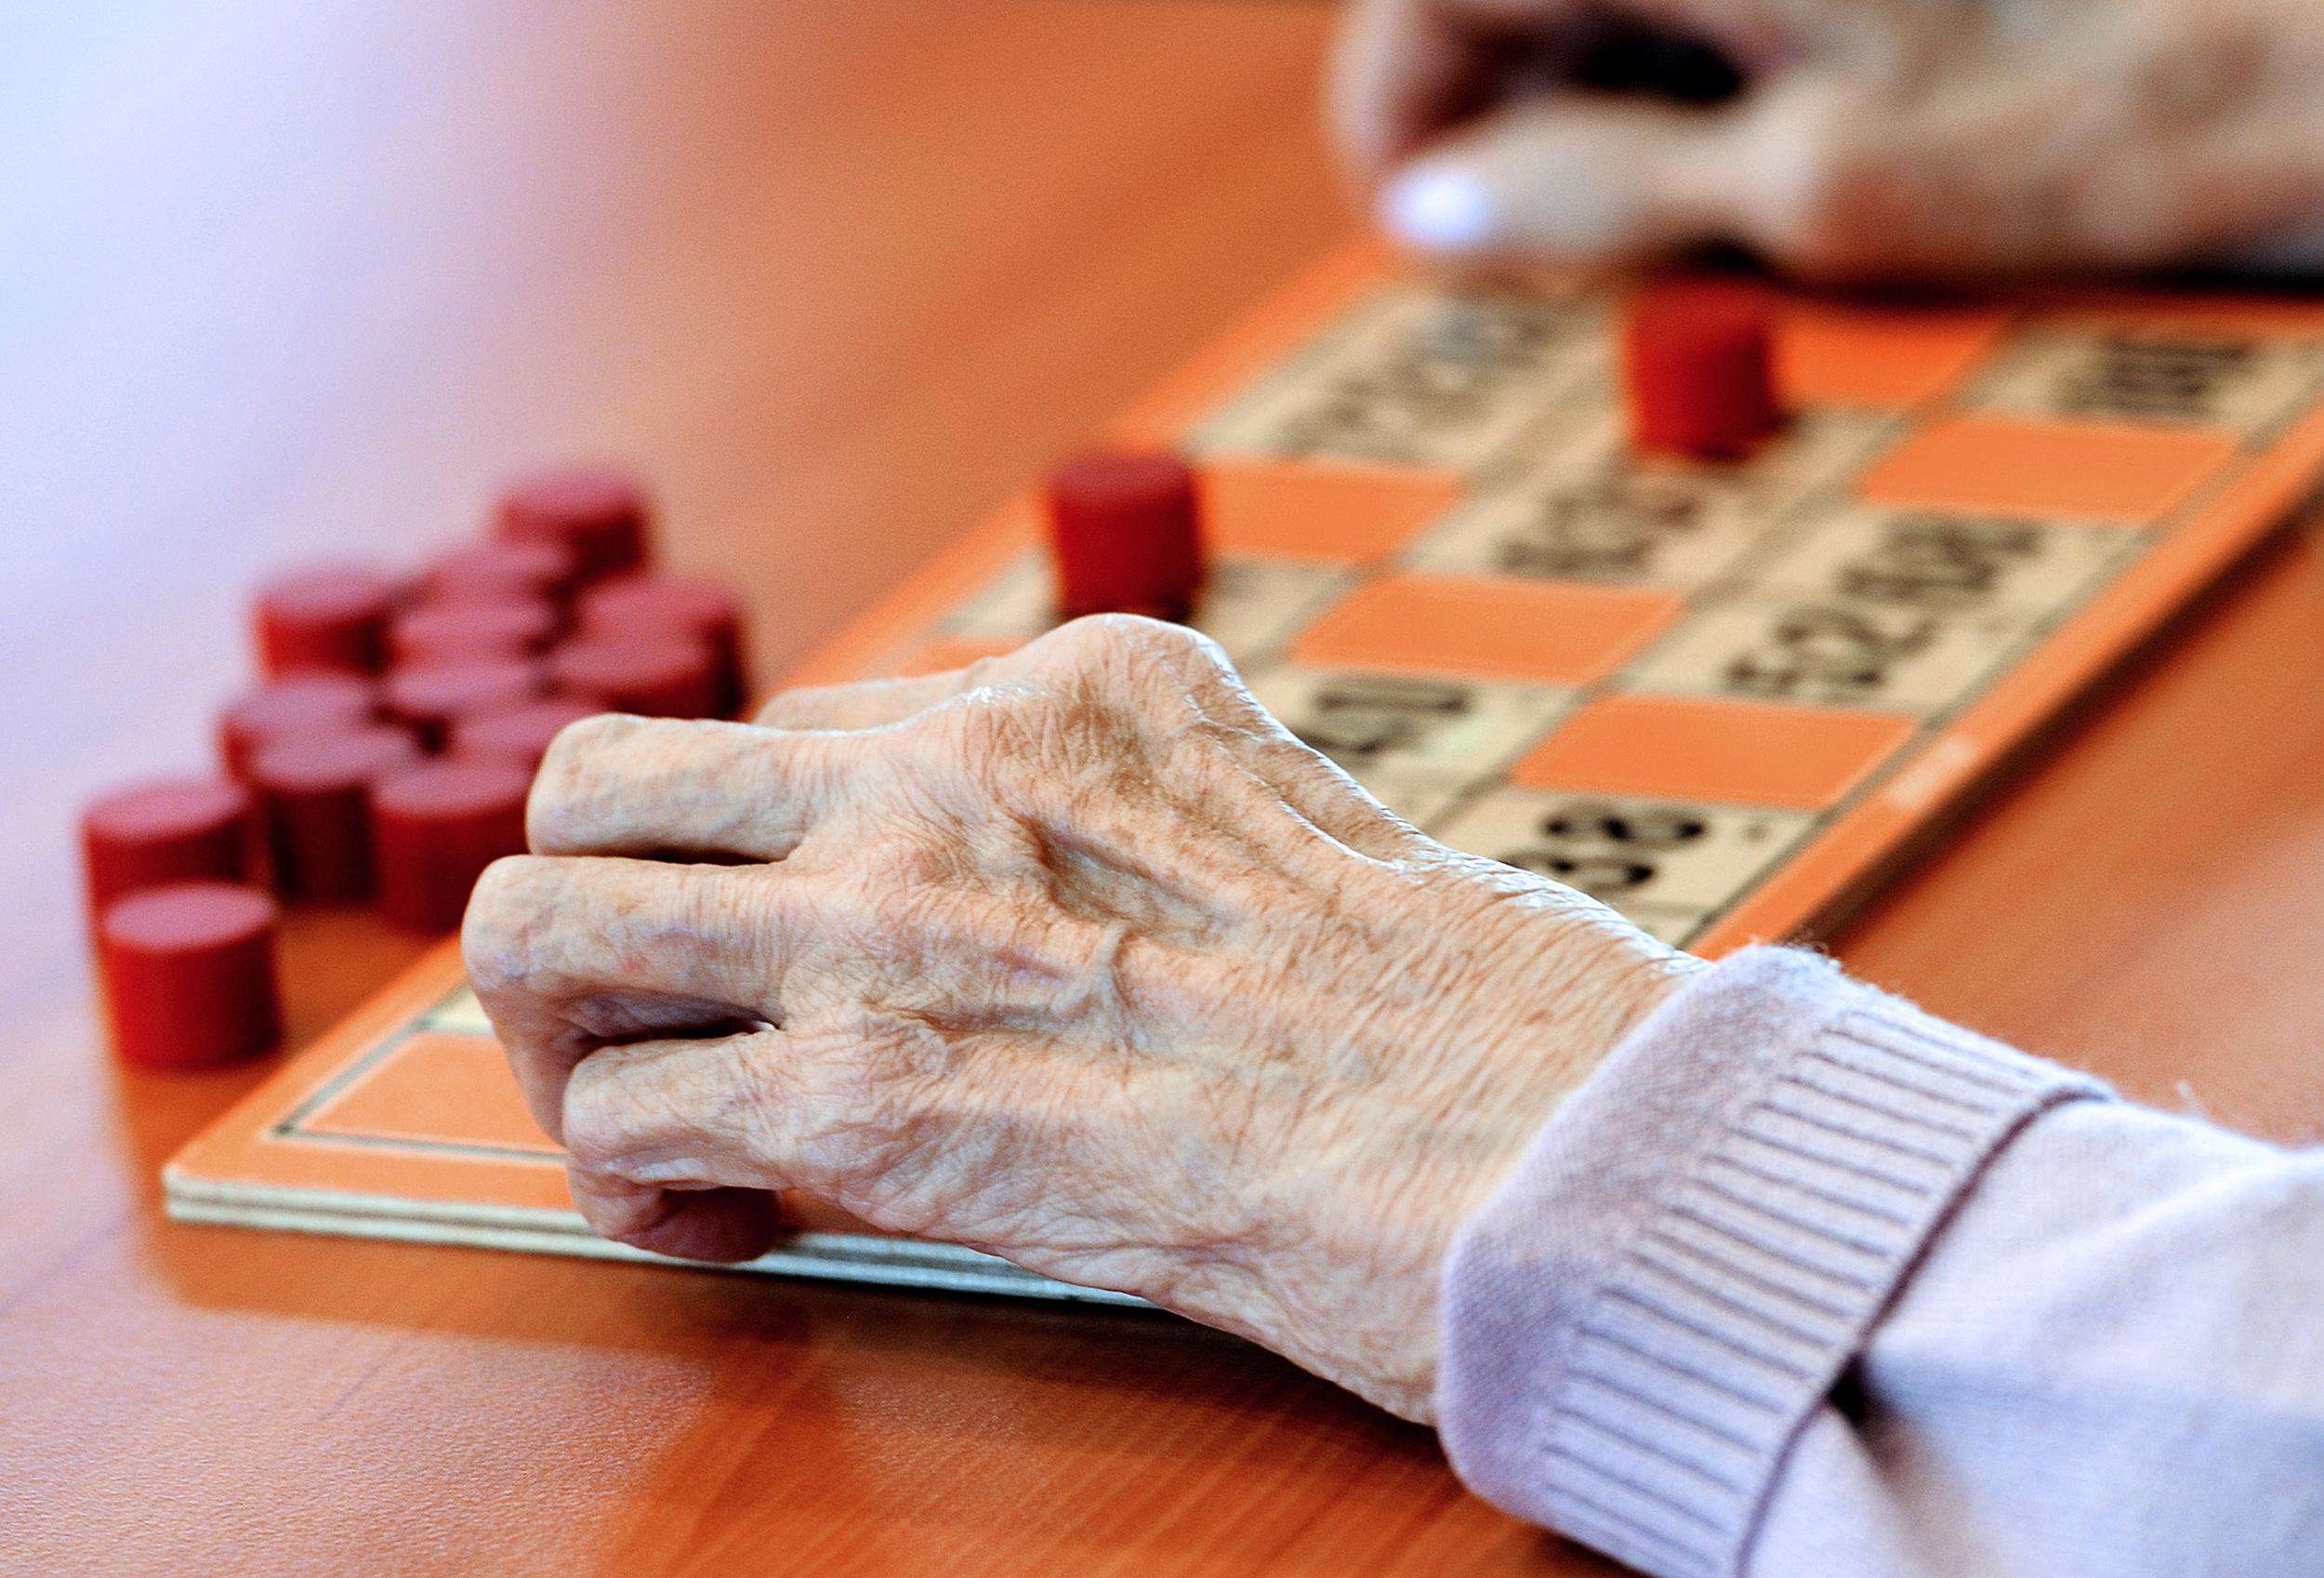 Image: An elderly woman plays bingo.